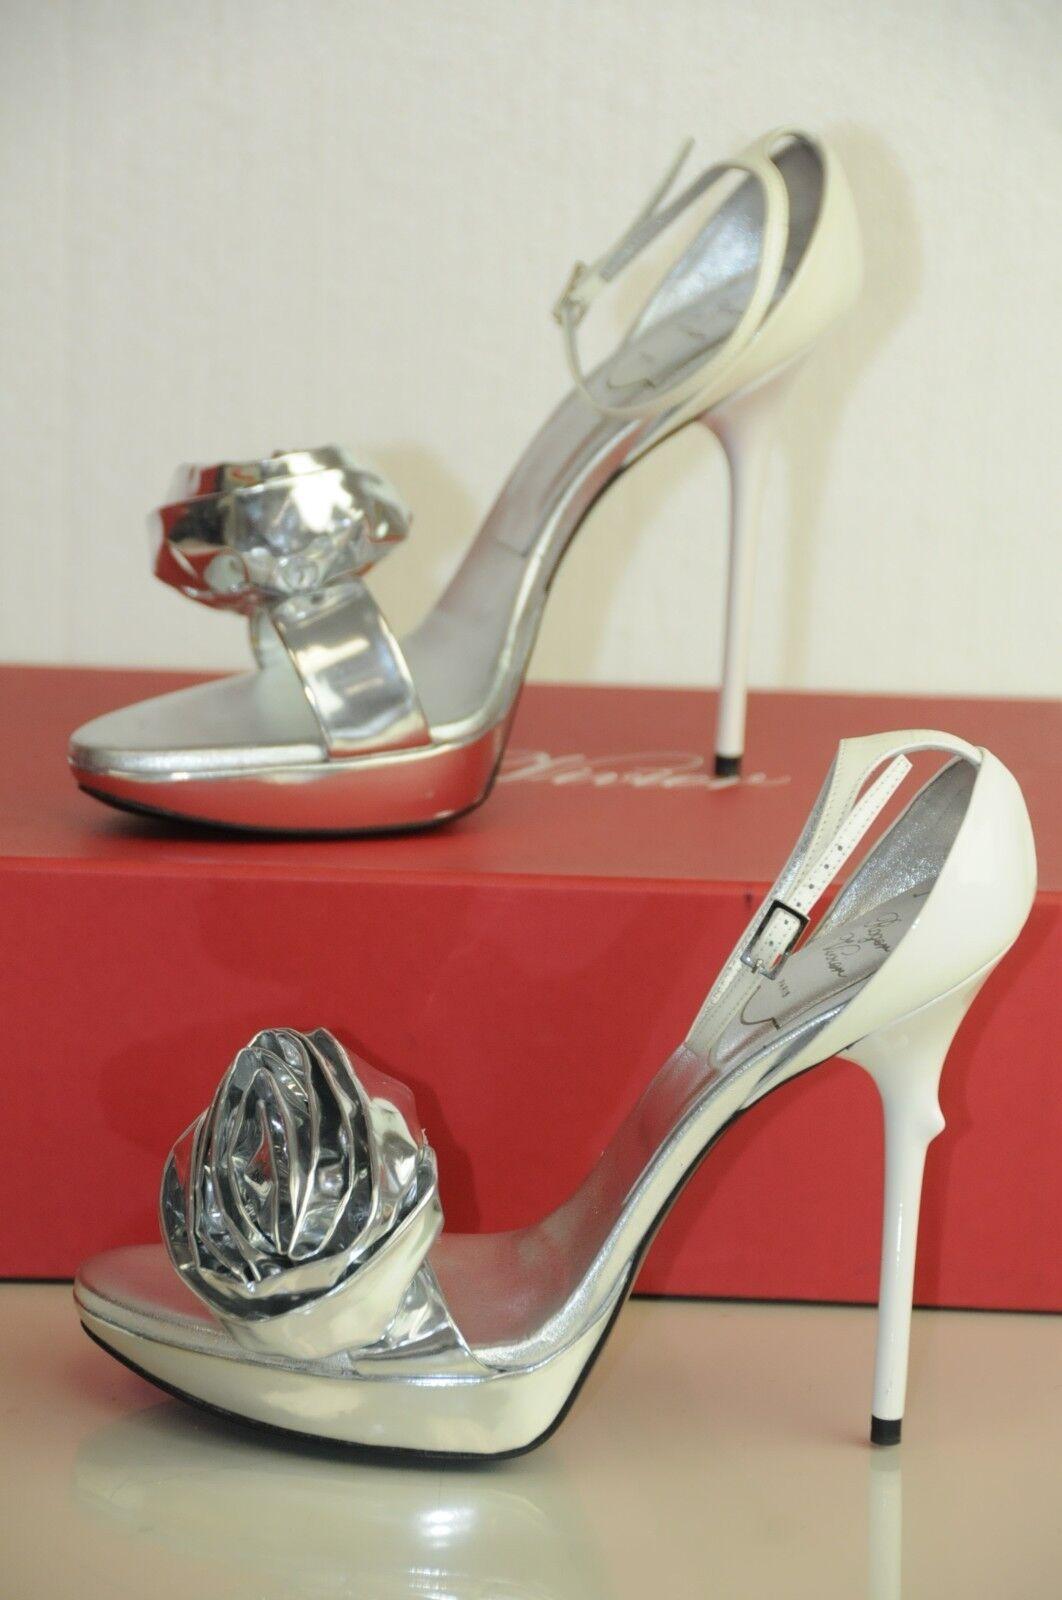 Neu Roger Vivier Rosa n Roll Silber Weiß Sandalen Schuhe 39.5 Selten Hochzeit